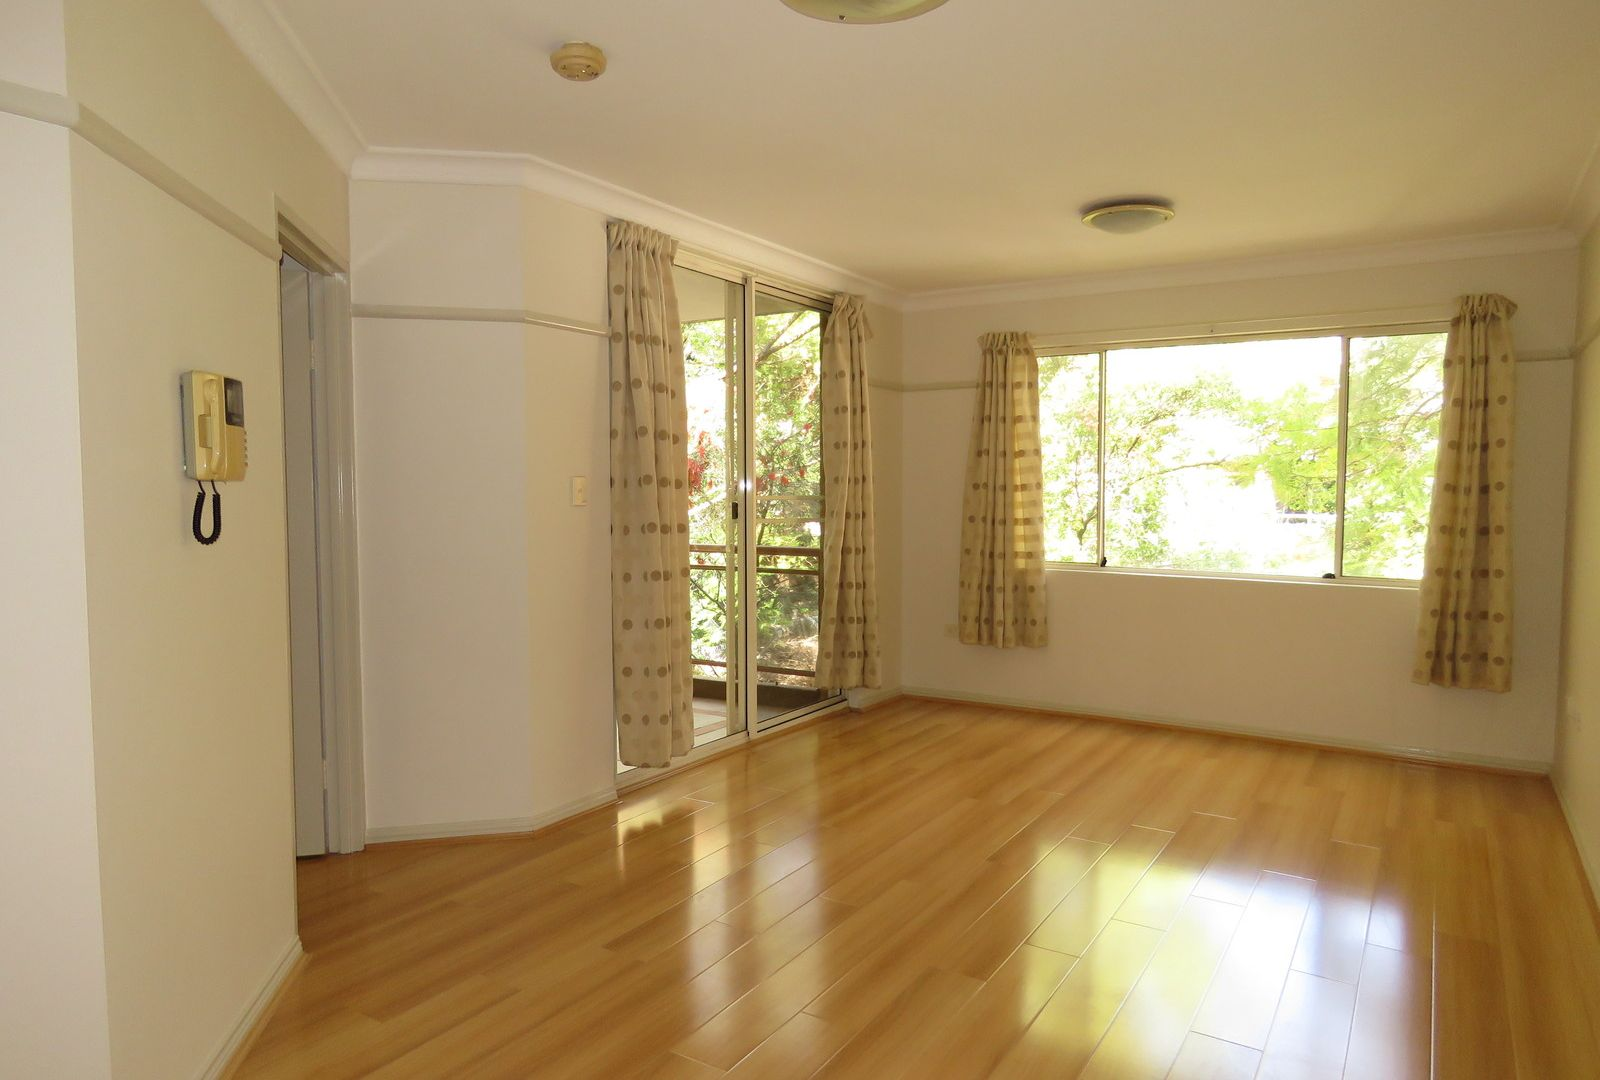 41/59 Good Street, Westmead NSW 2145, Image 2